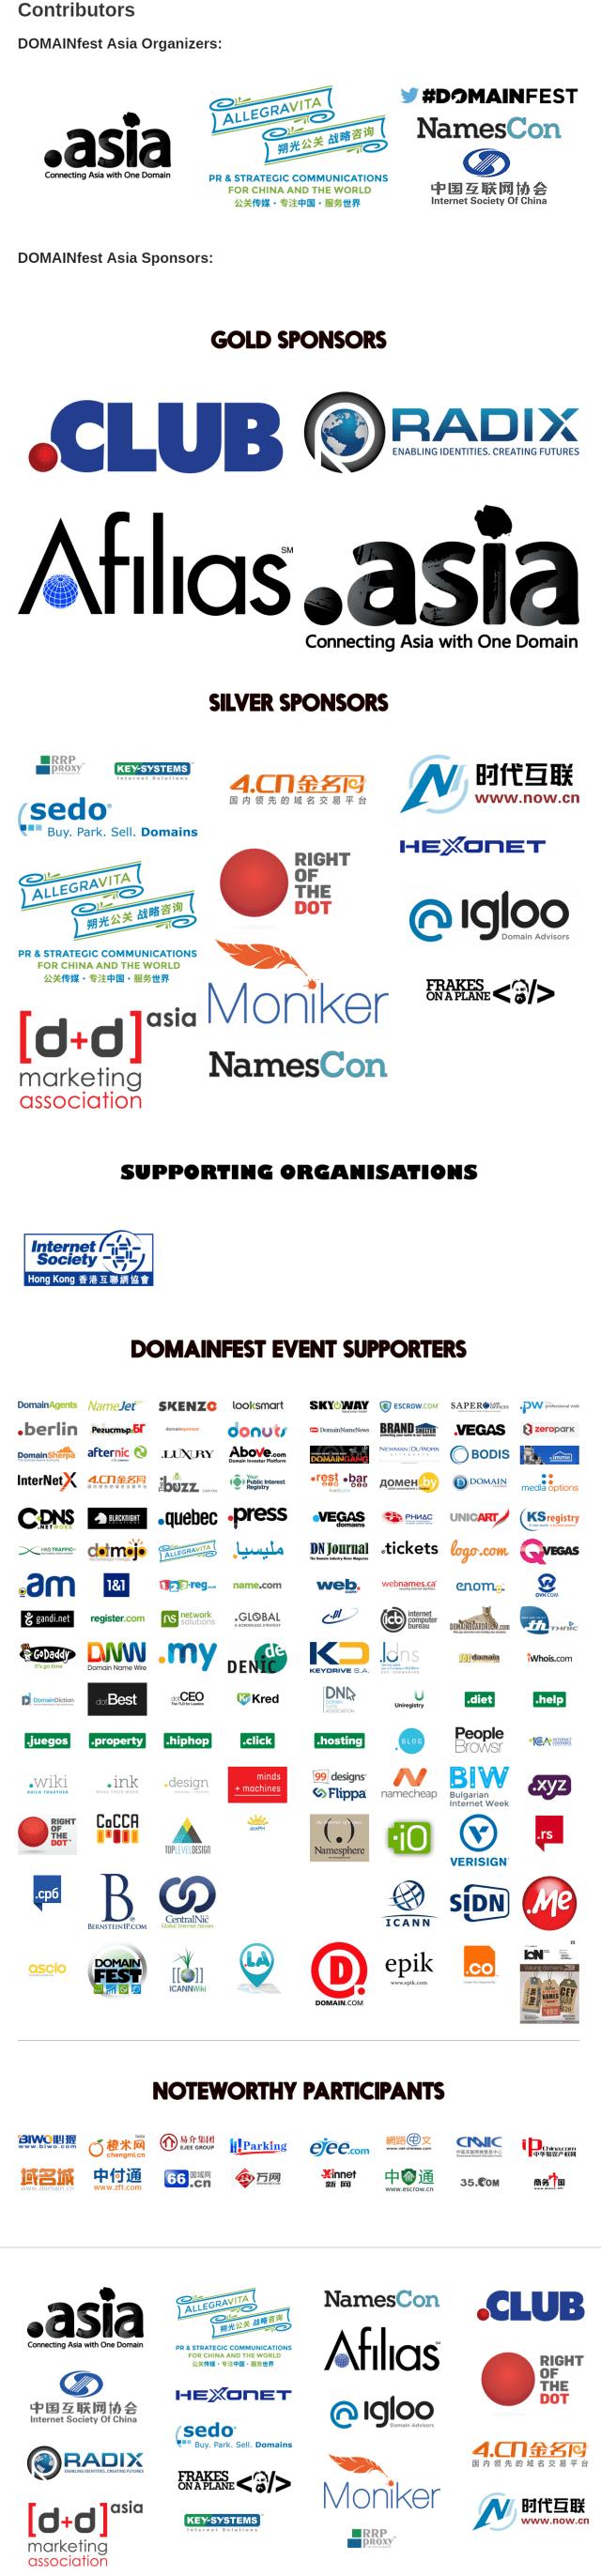 DOMAINfest Asia  Contributors